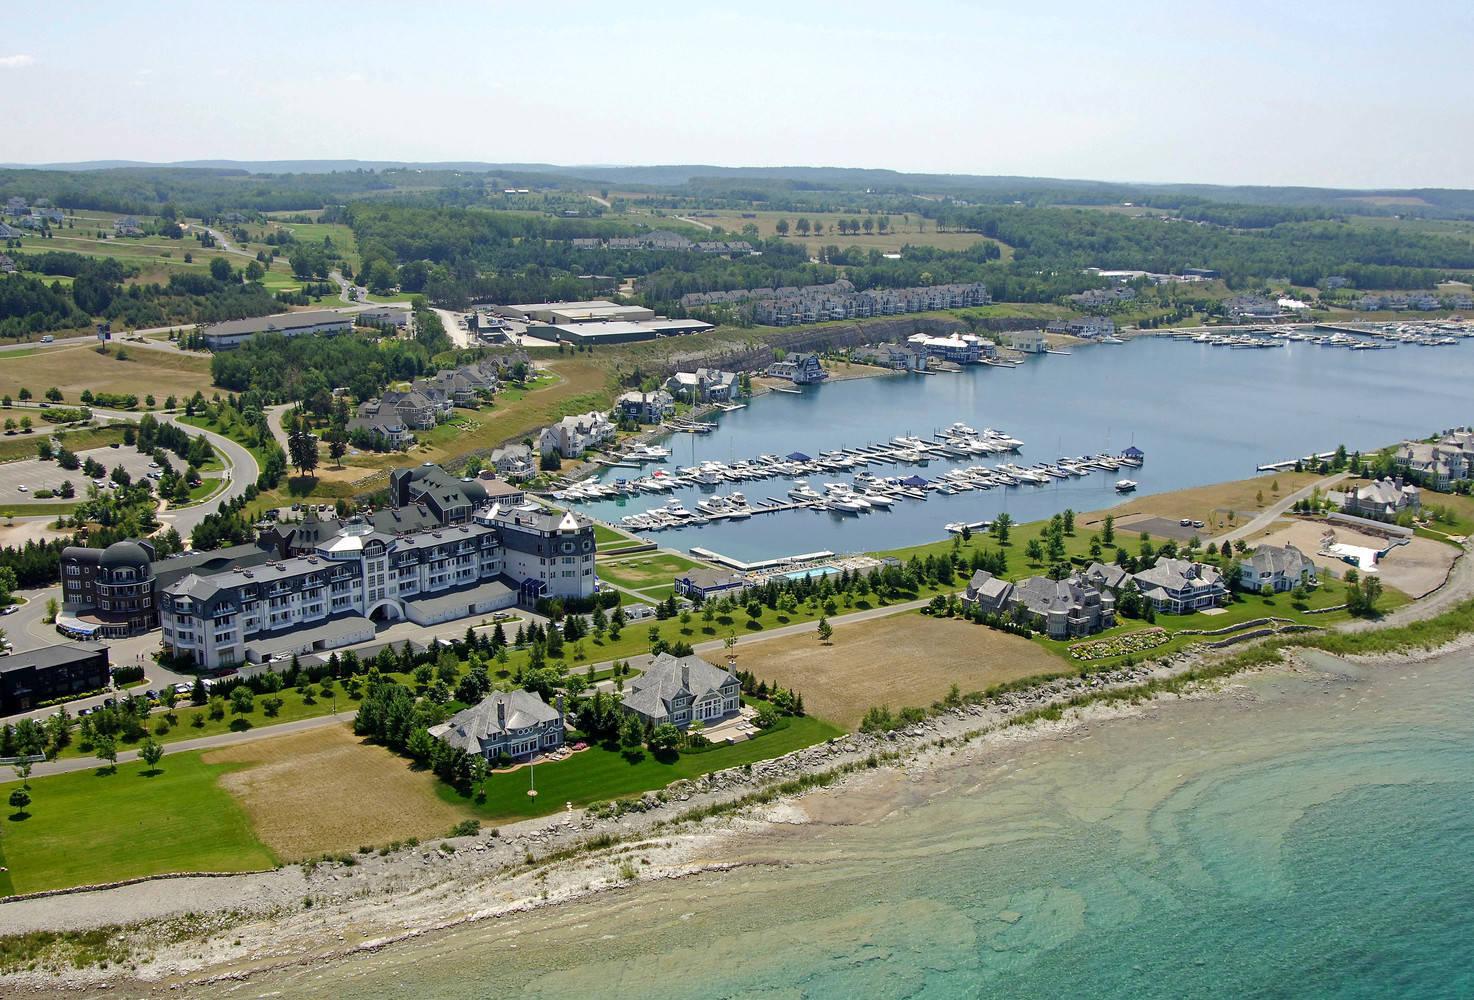 Bay Harbor Lake Marina Slip Dock Mooring Reservations